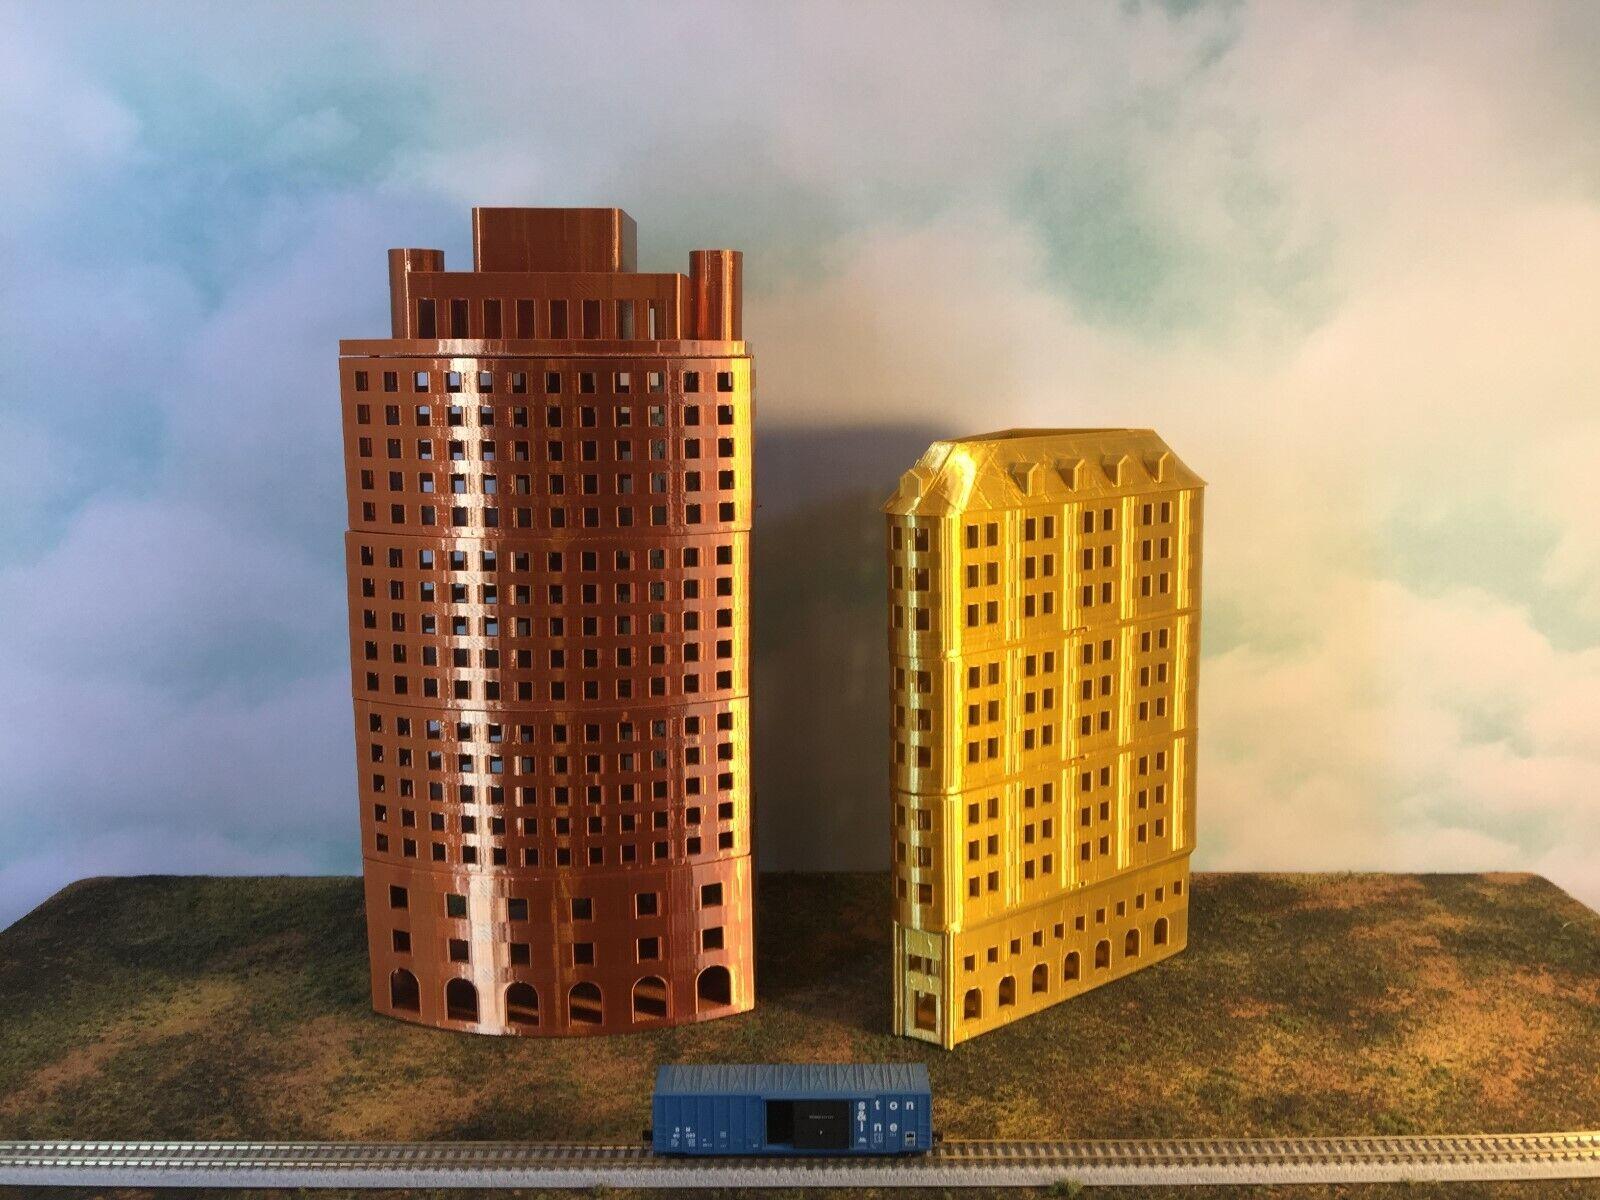 mejor vendido Cobre Metálico Oficina Oficina Oficina rascacielos edificio Z escala 1 220 añadir pisos para personalizar  venta caliente en línea